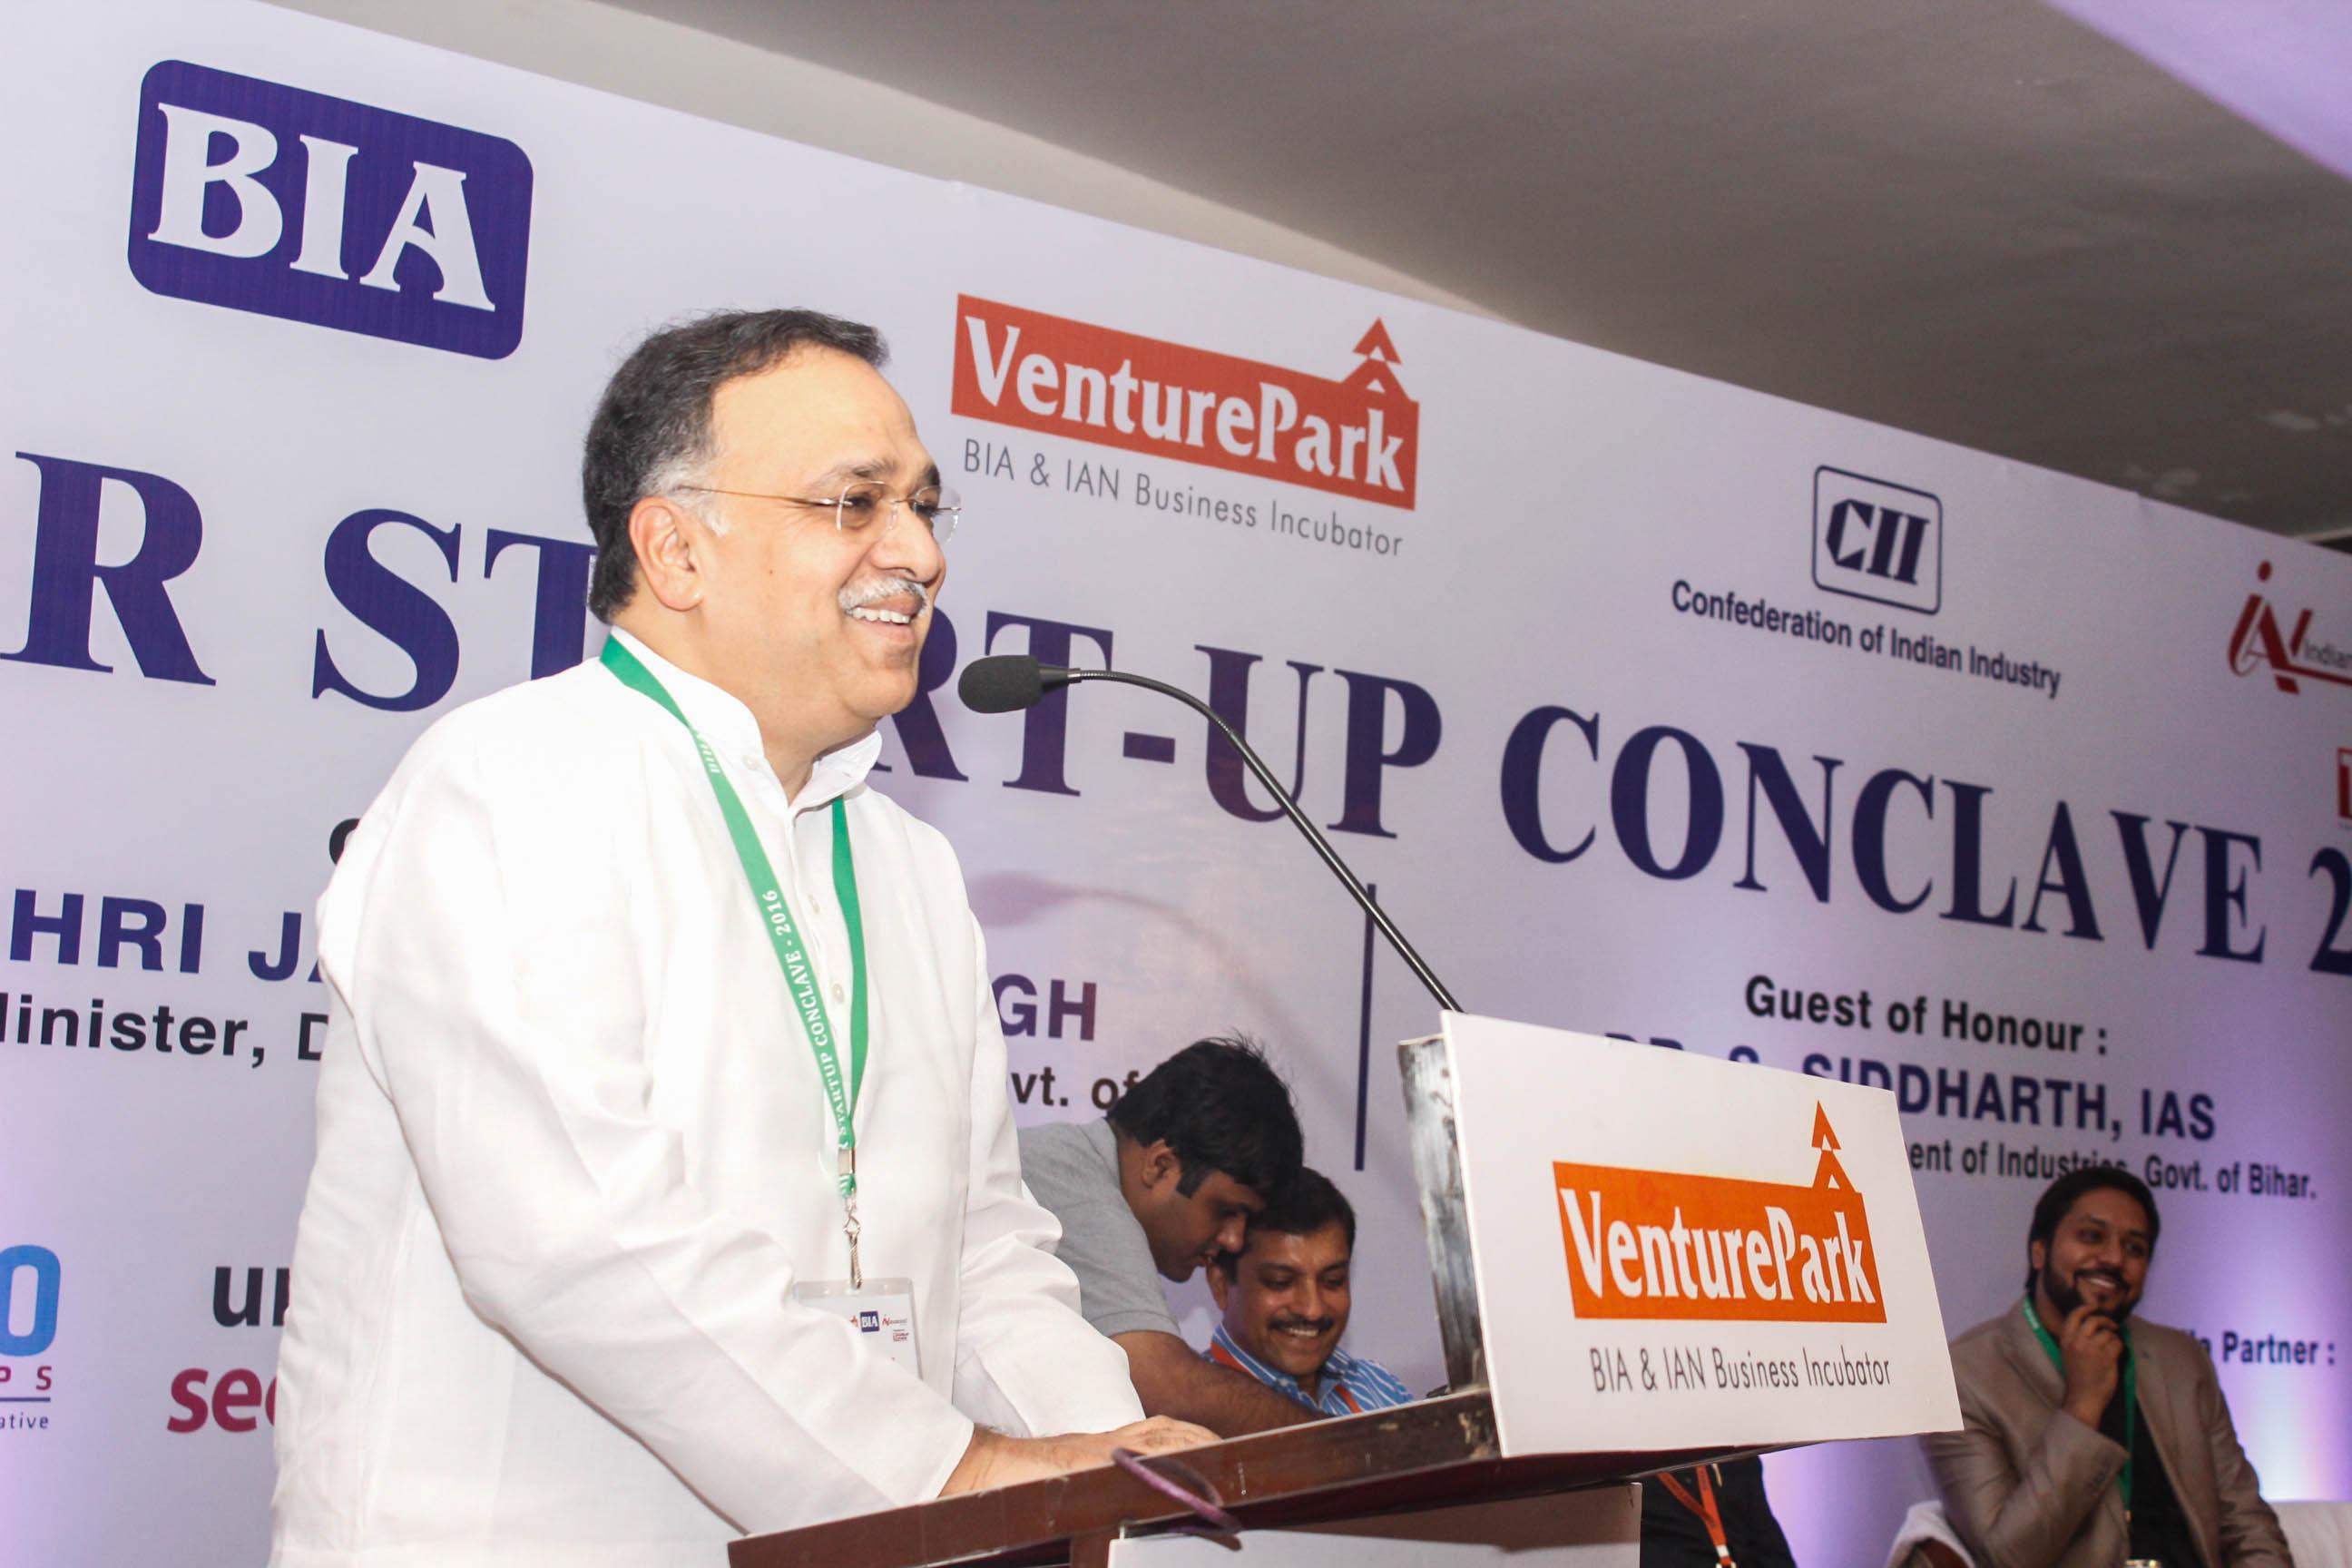 Bihar Start-up conclave, Mr Pramath Raj Sinha